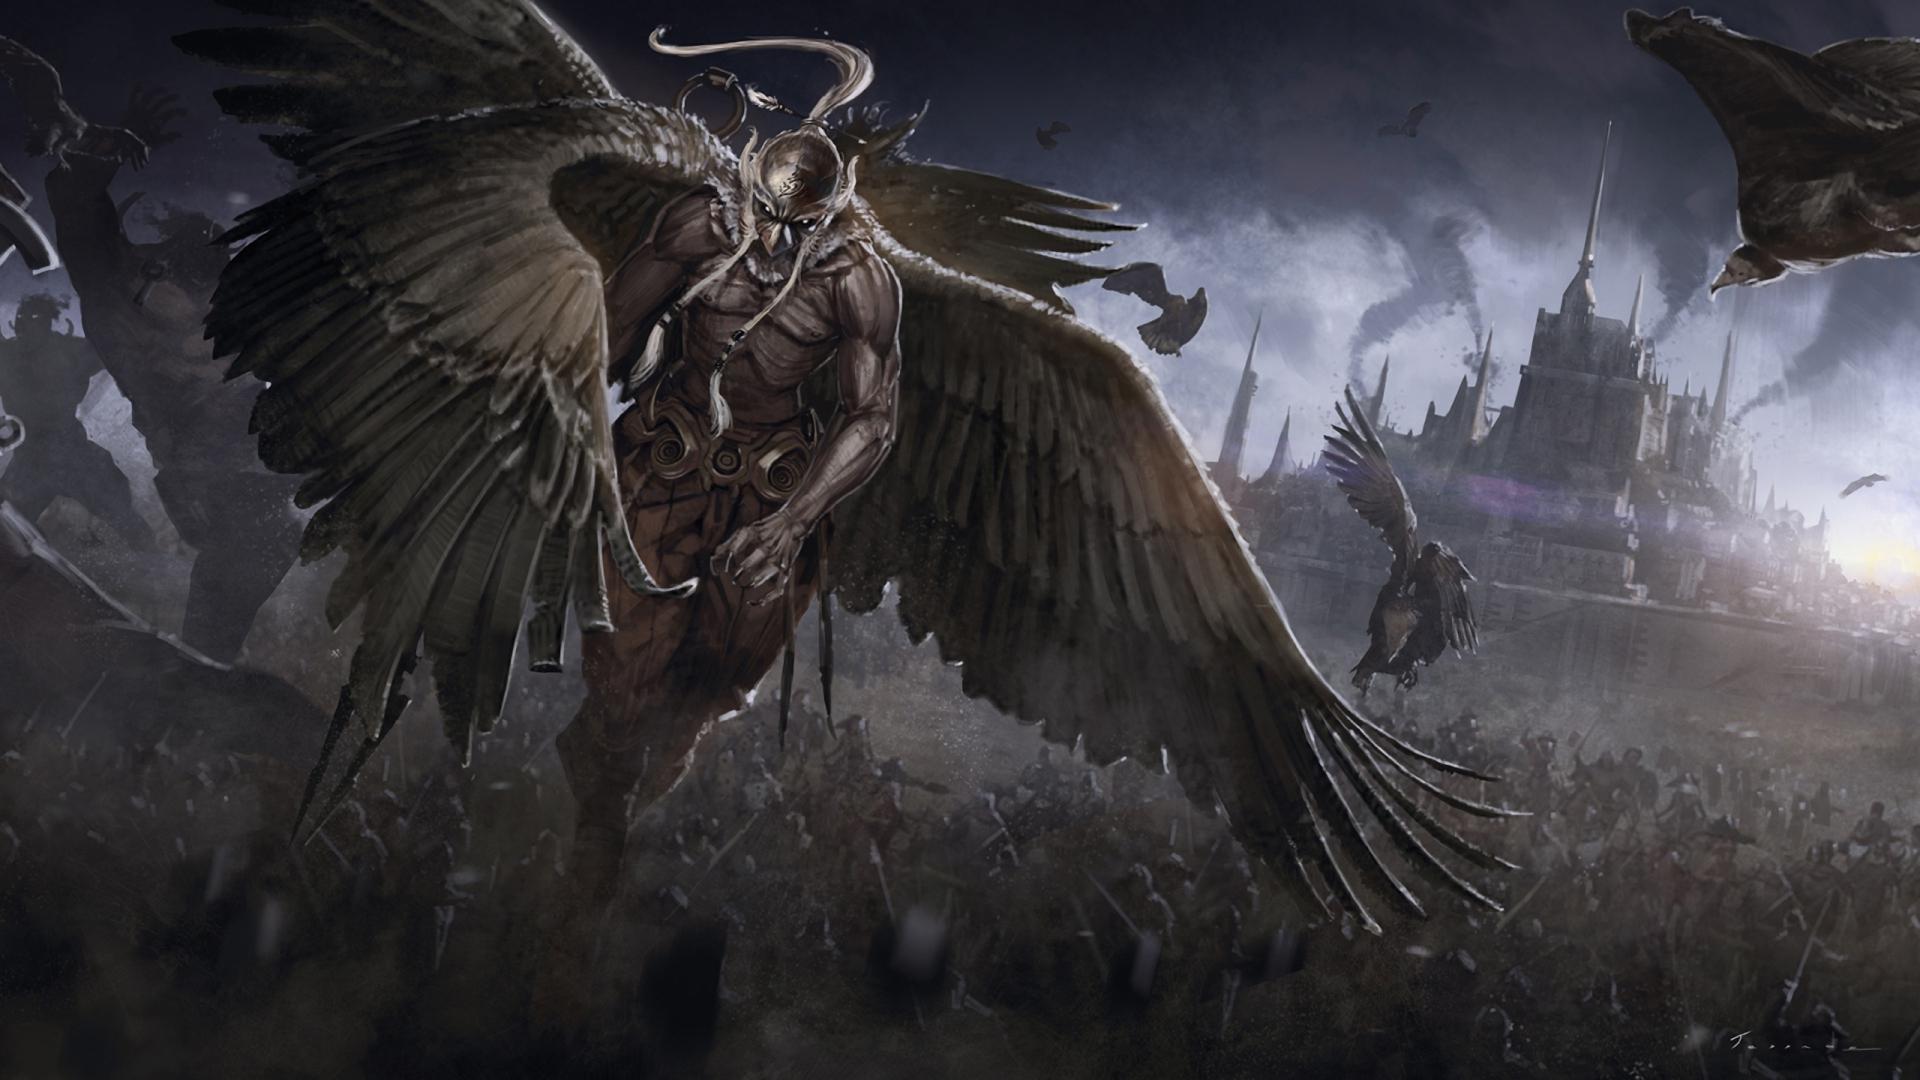 Warrior Battle Army Creatures War Cities Castle Dark Download